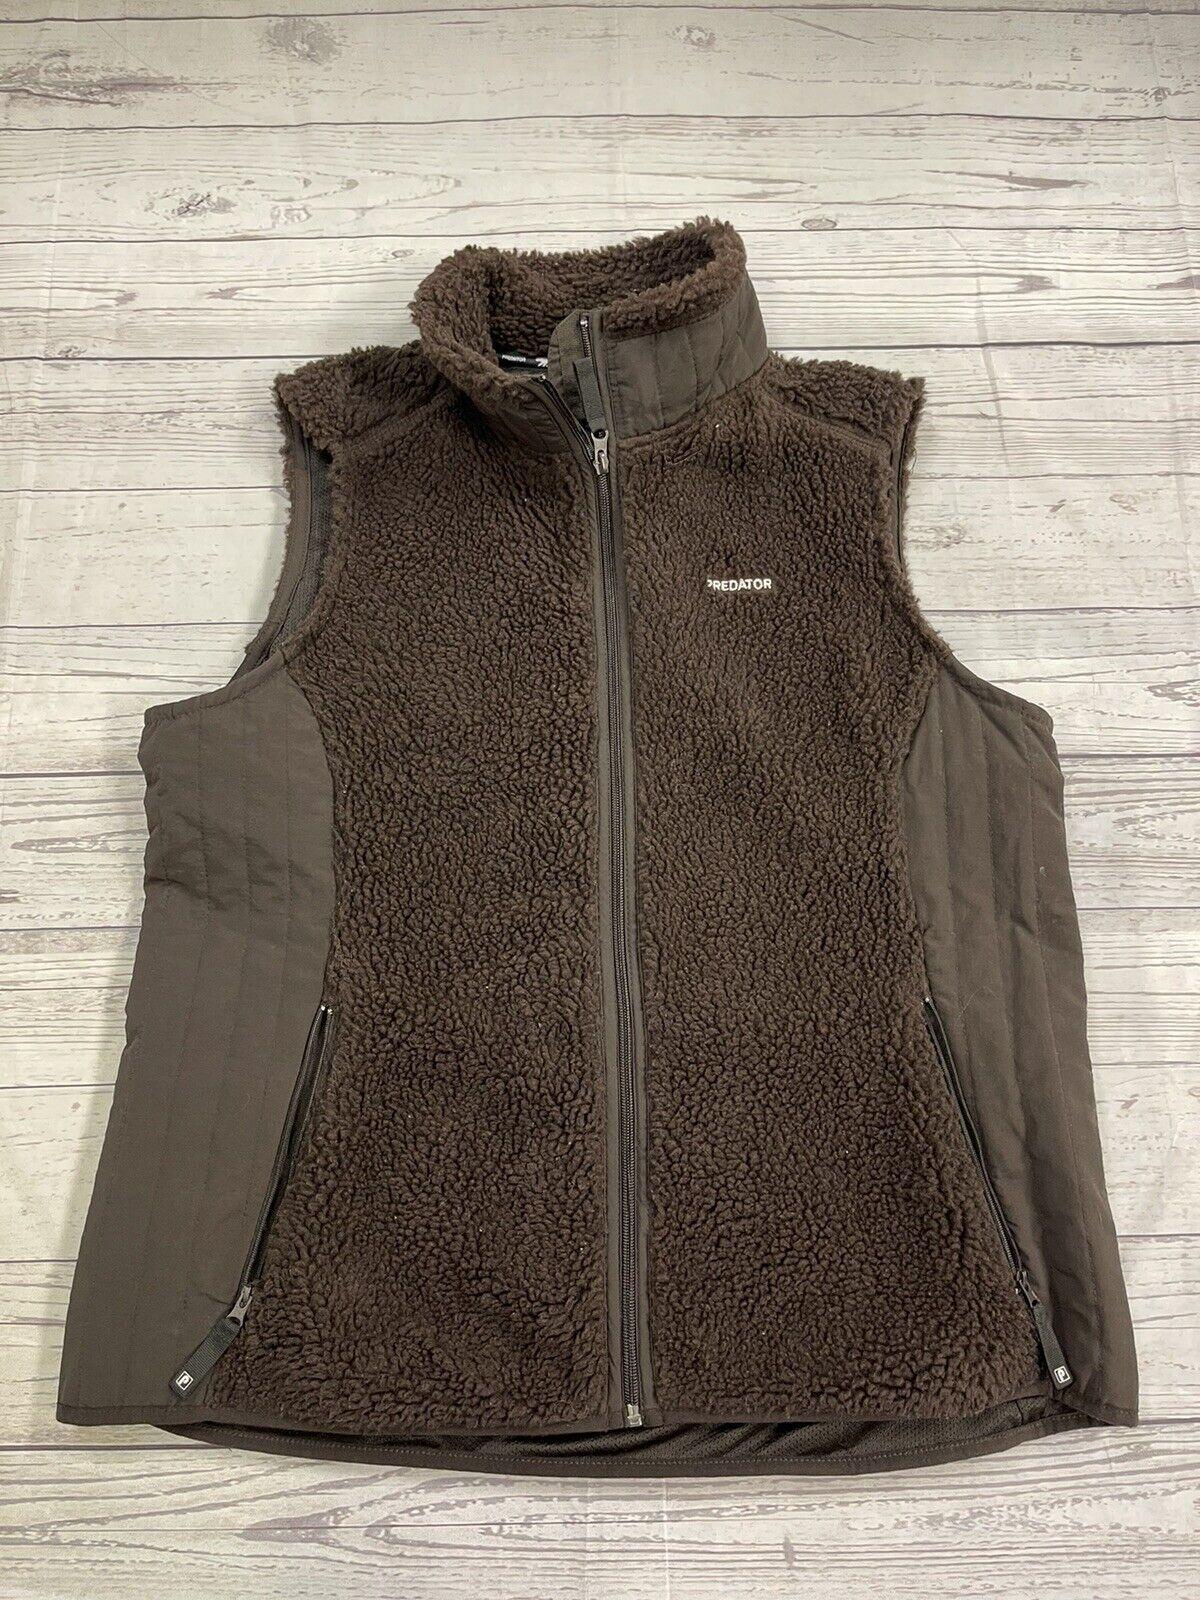 Predator Women's Size XL Brown Fuzzy Sherpa Full Zip Vest